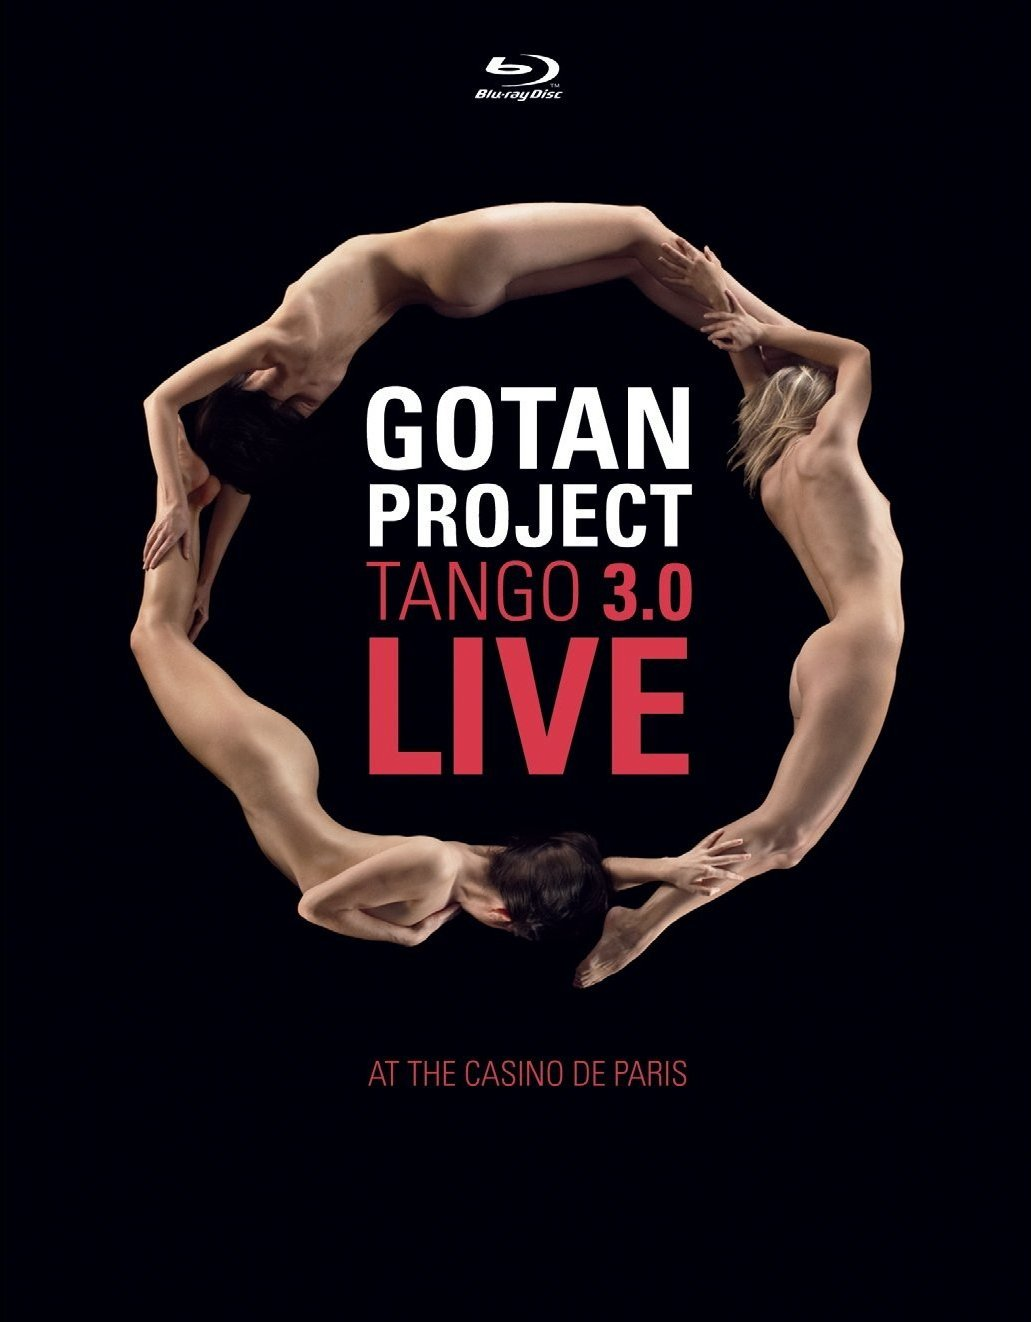 Gotan project live casino paris casino with coin slot machines